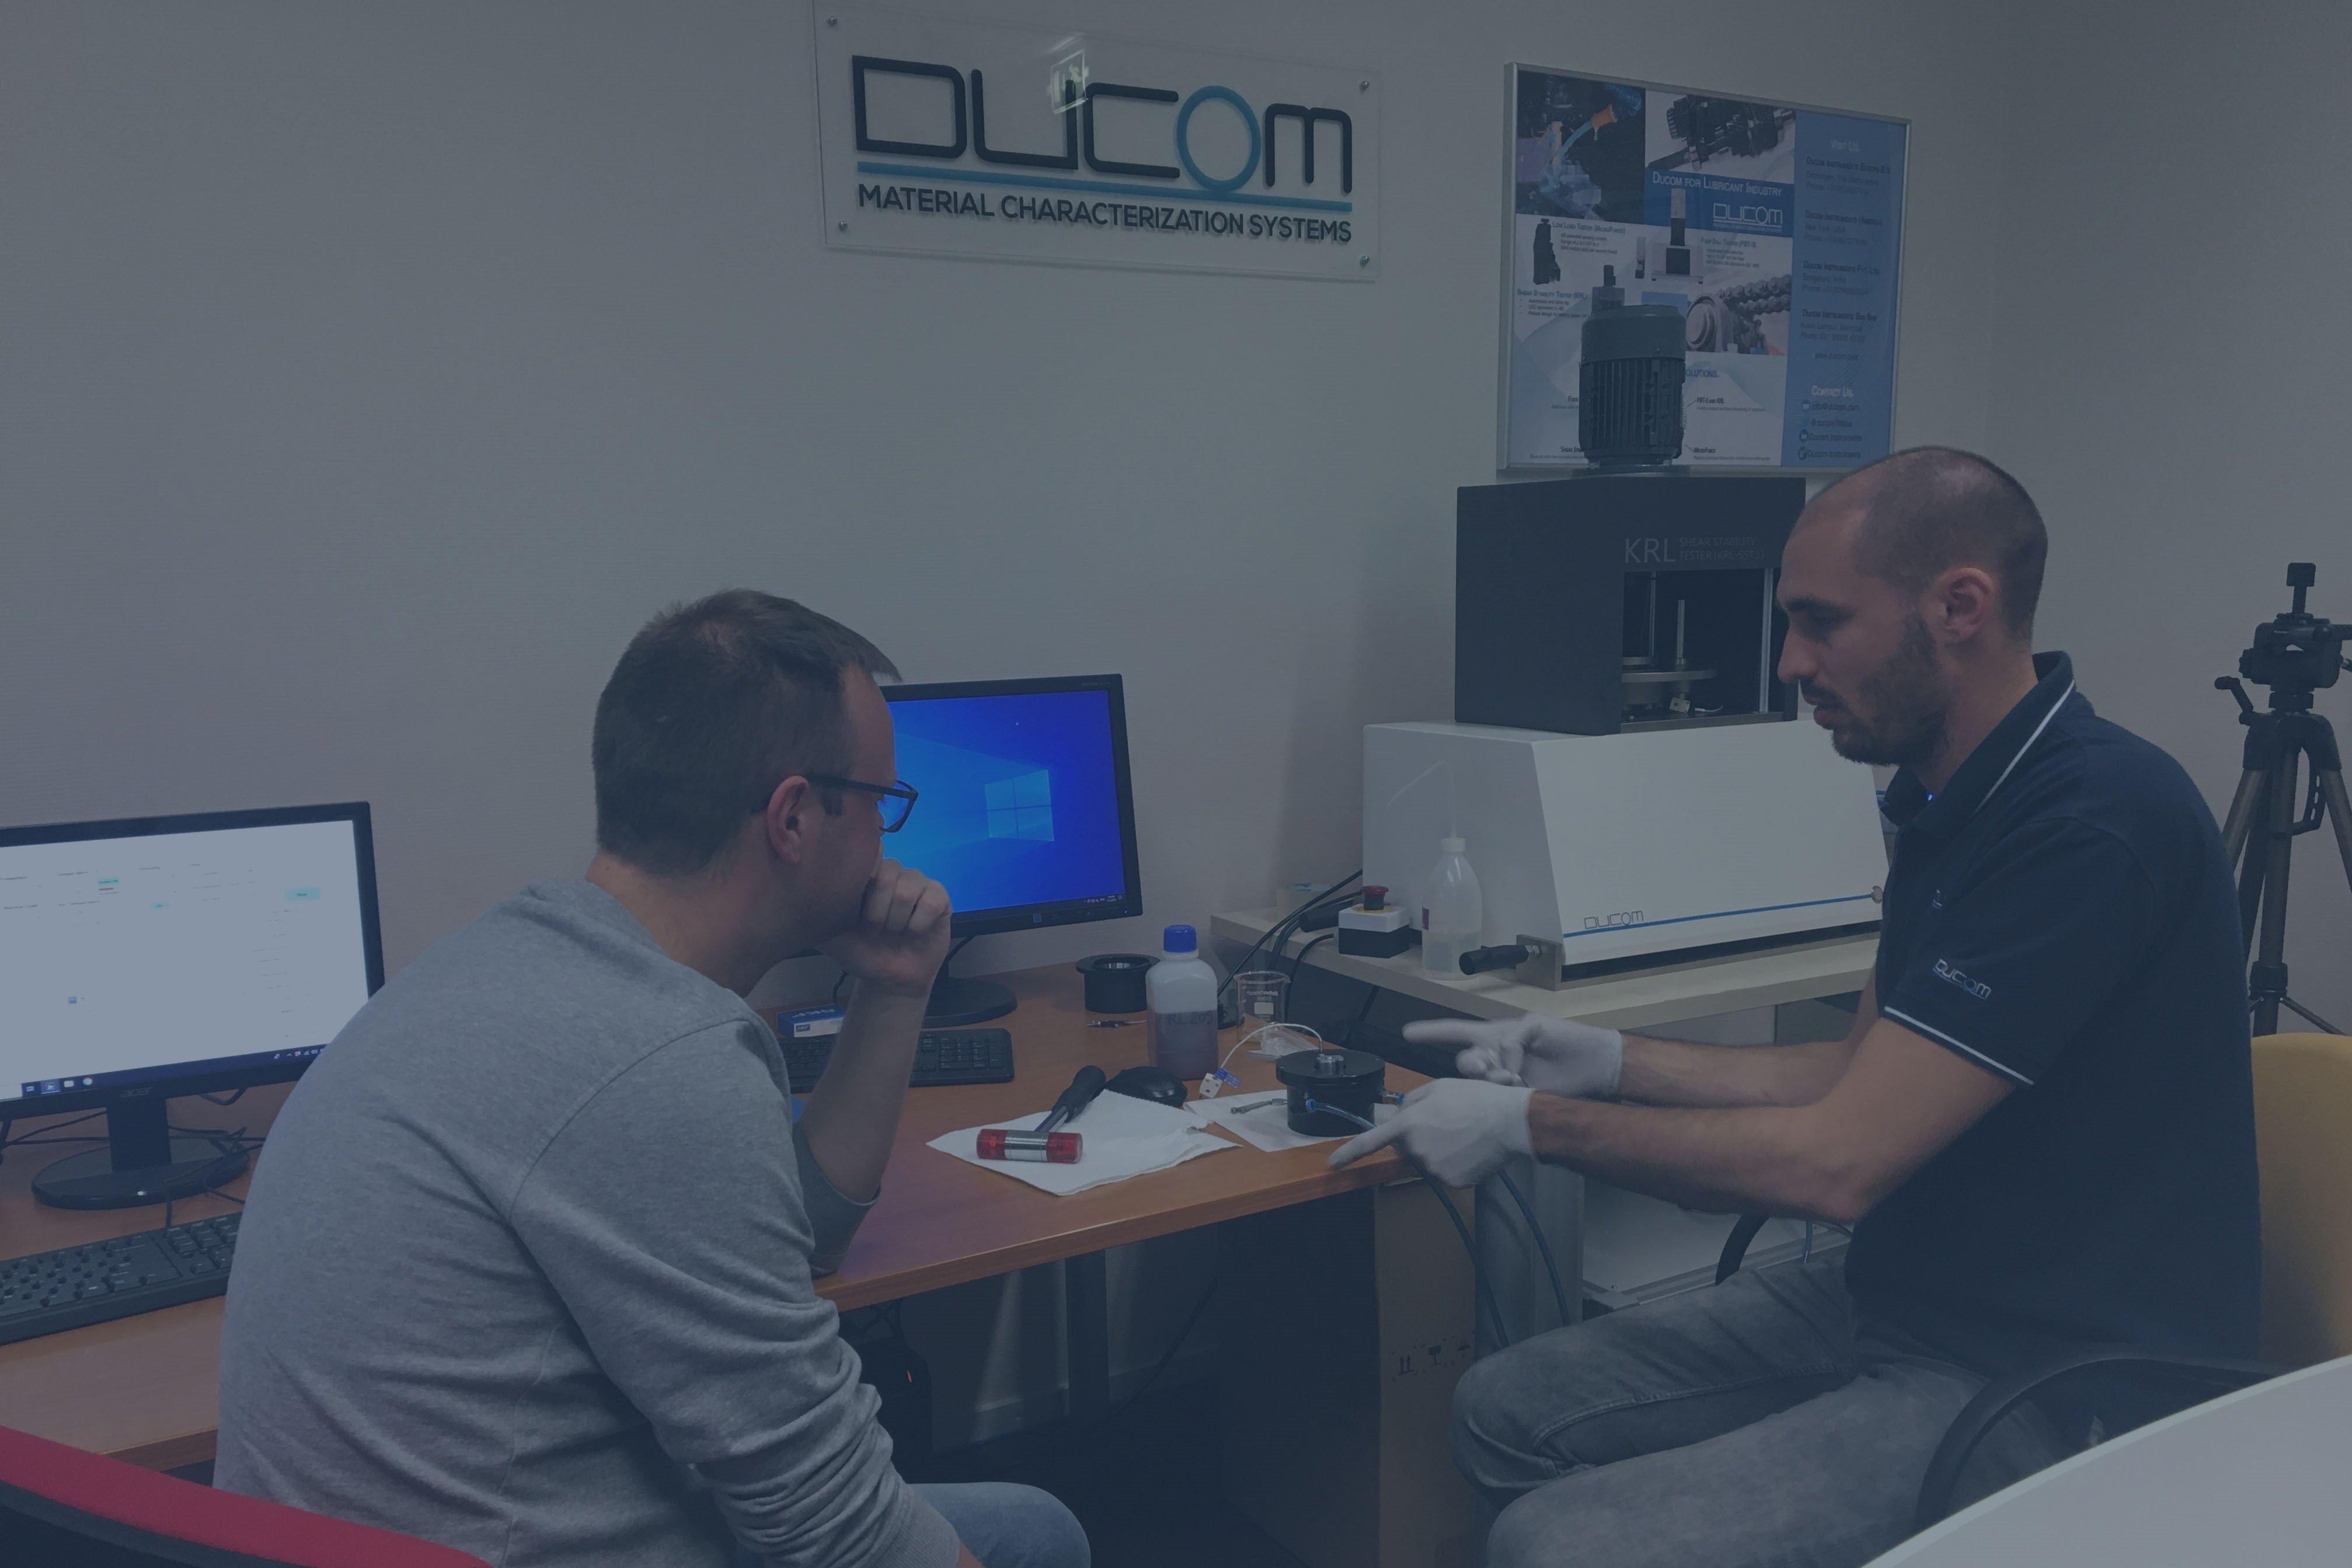 Ducom Product Training - Overlay - 3x2